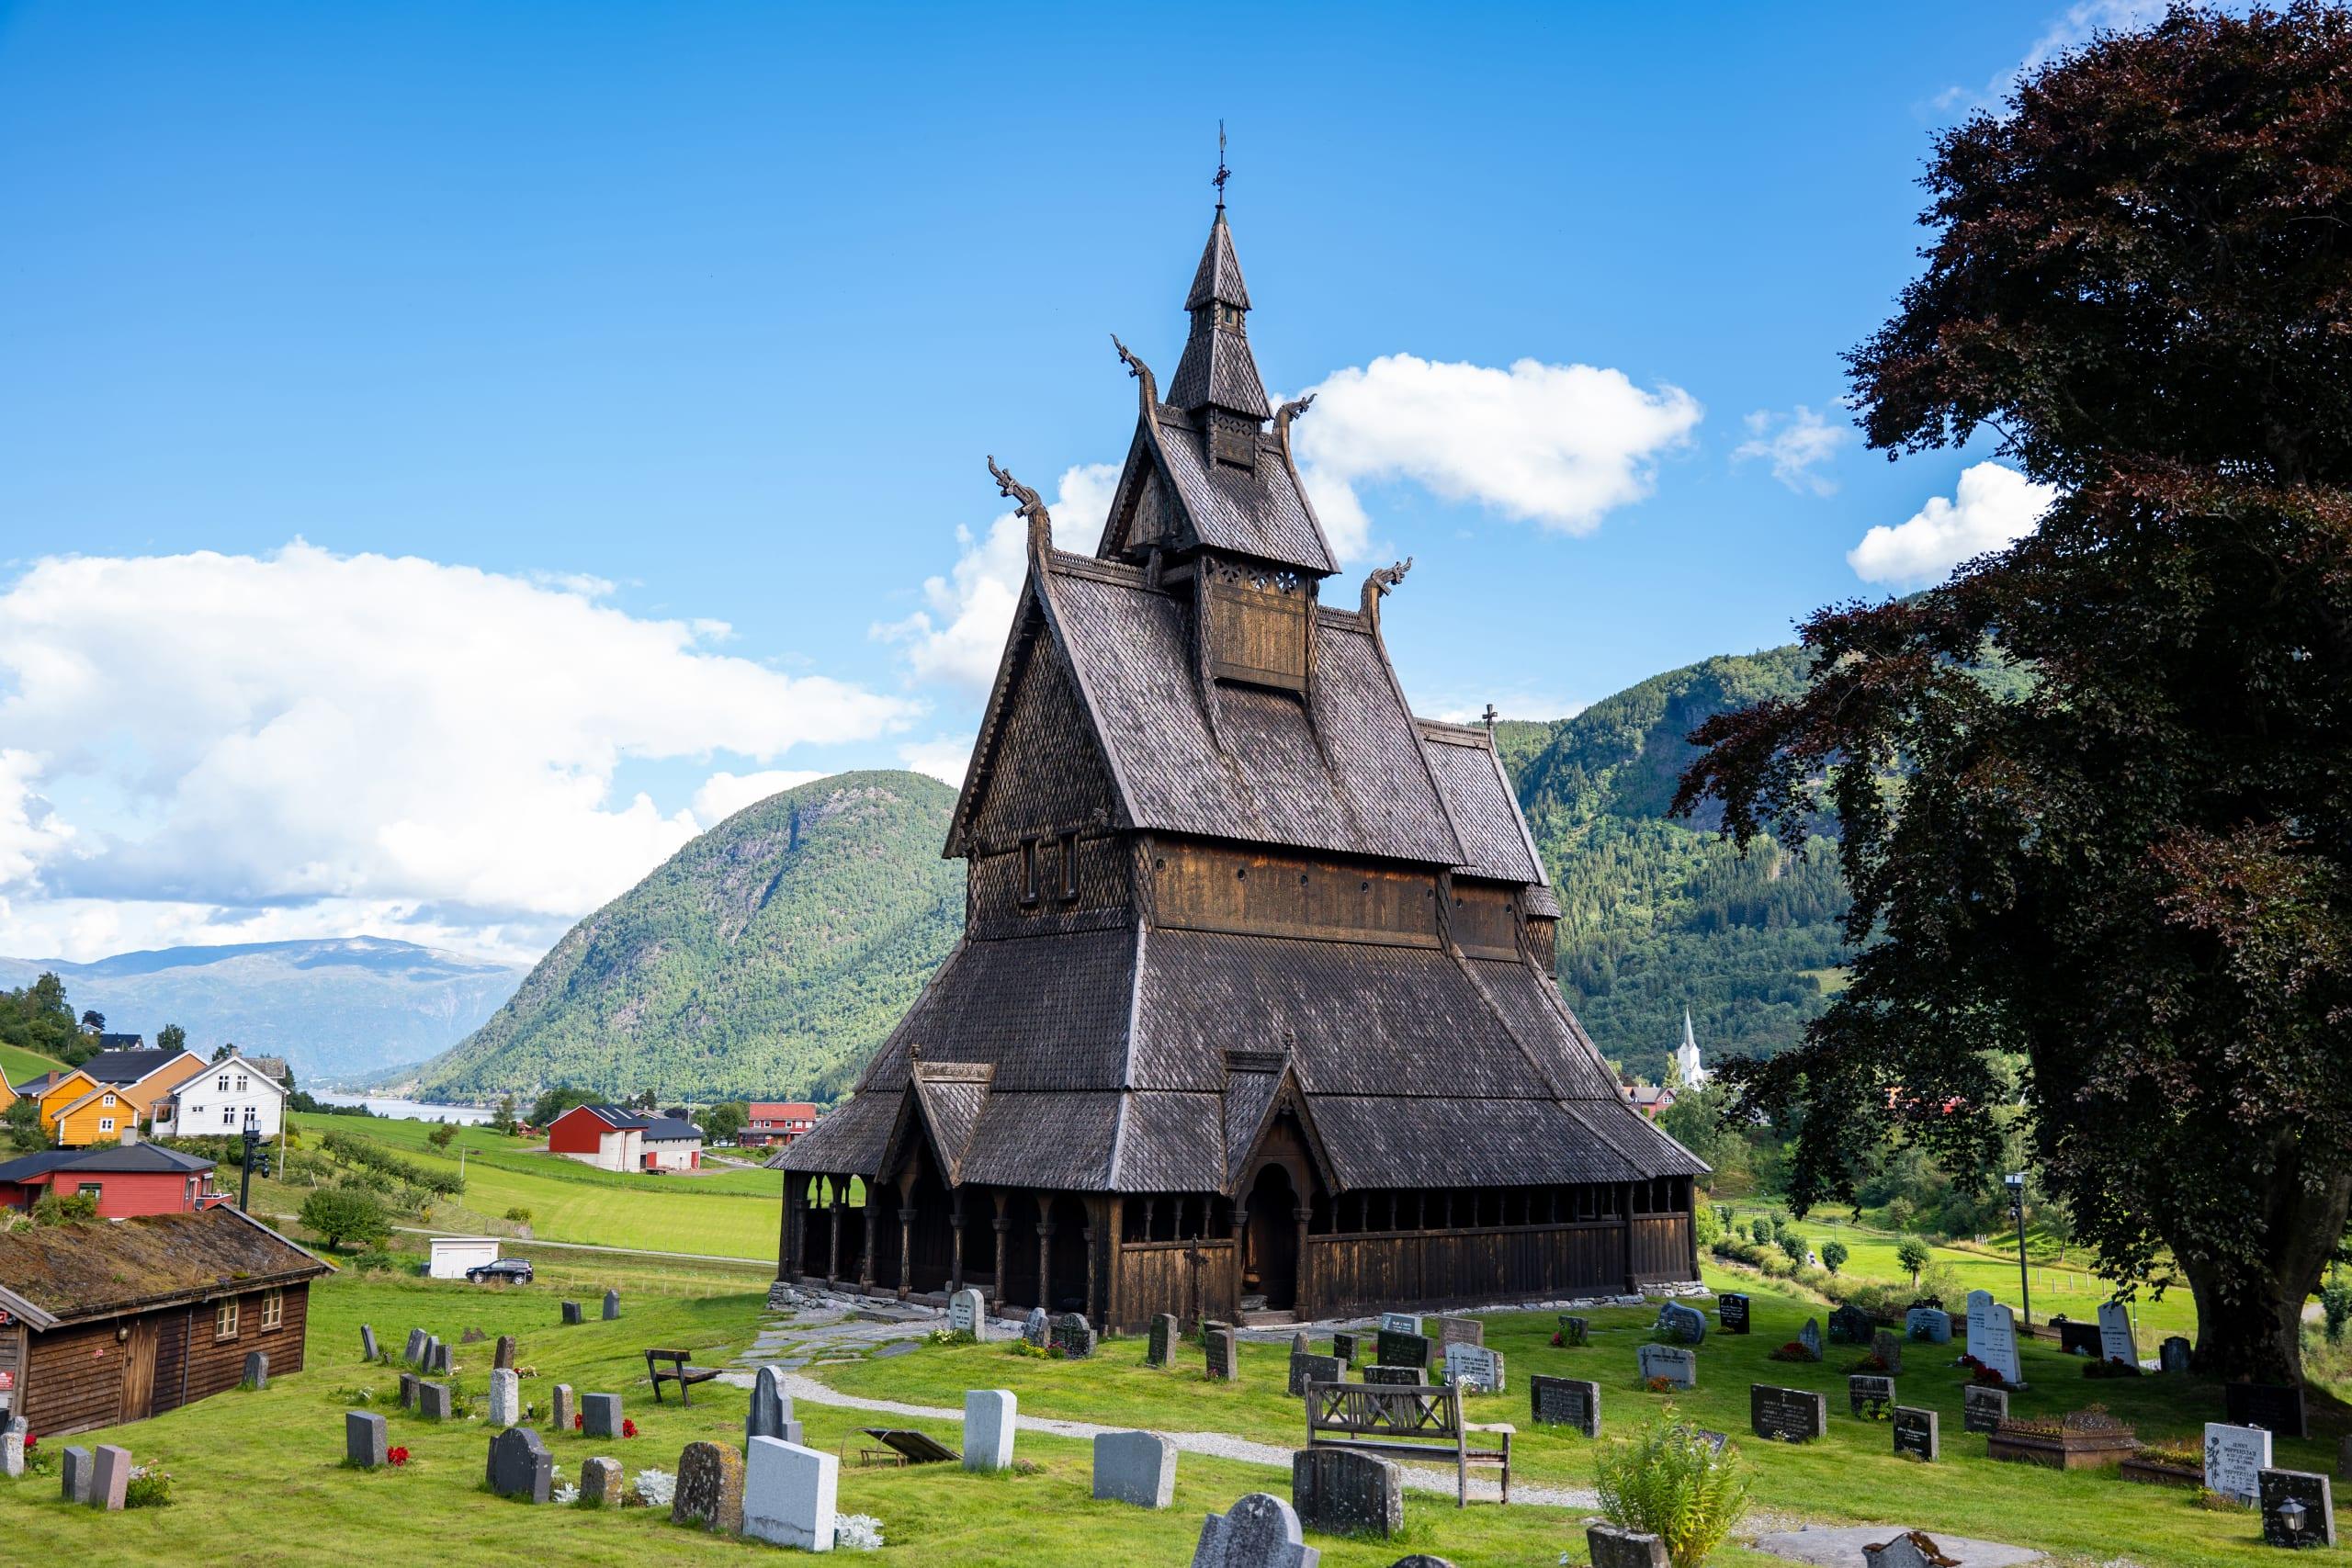 Hopperstad stave church in Vik